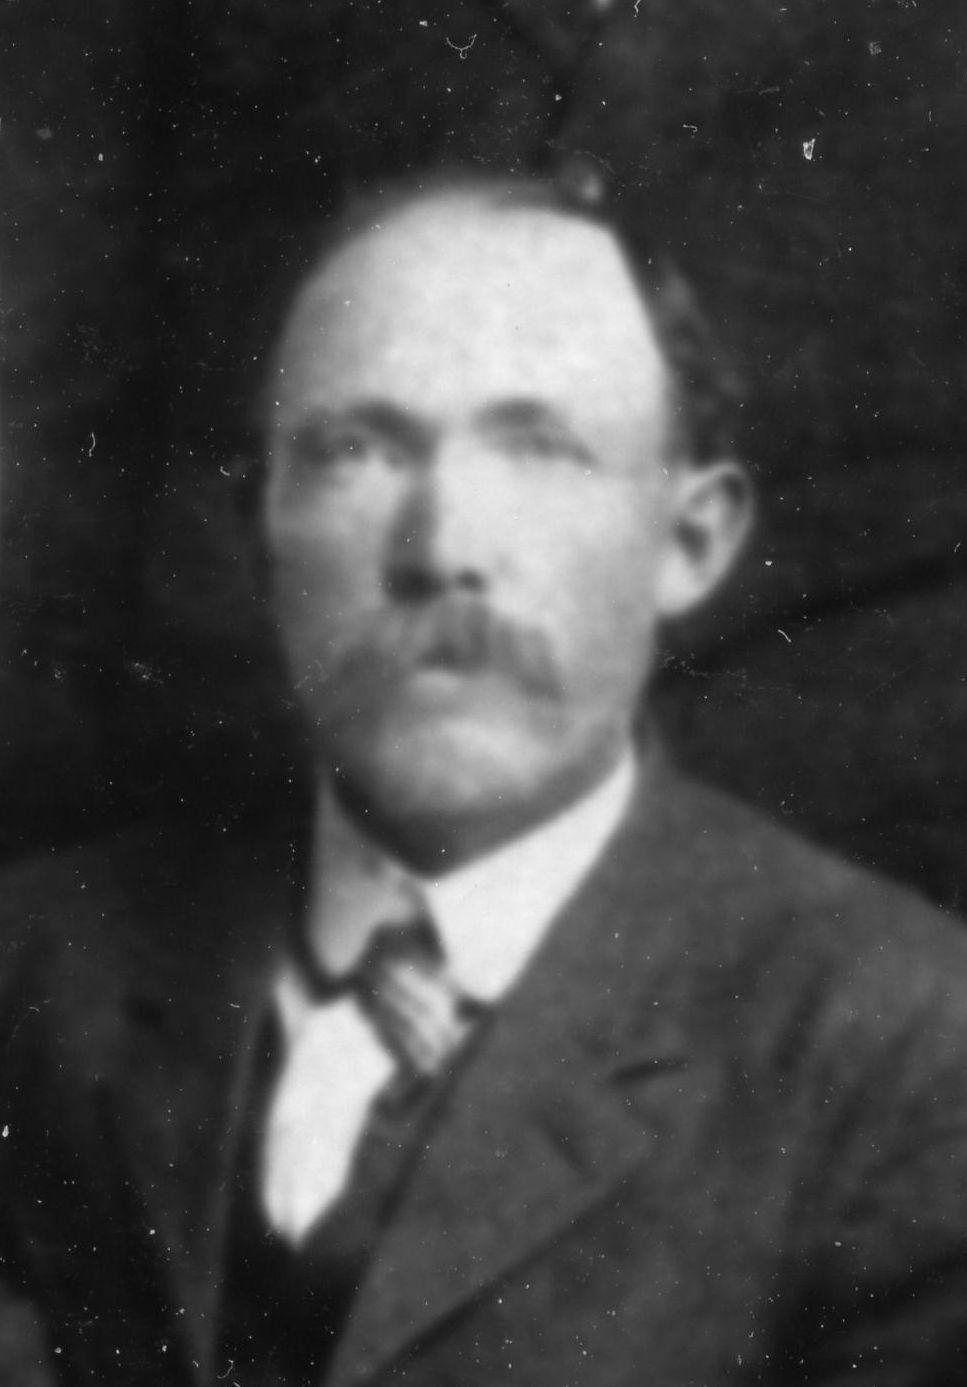 Robinson, Robert Eccles